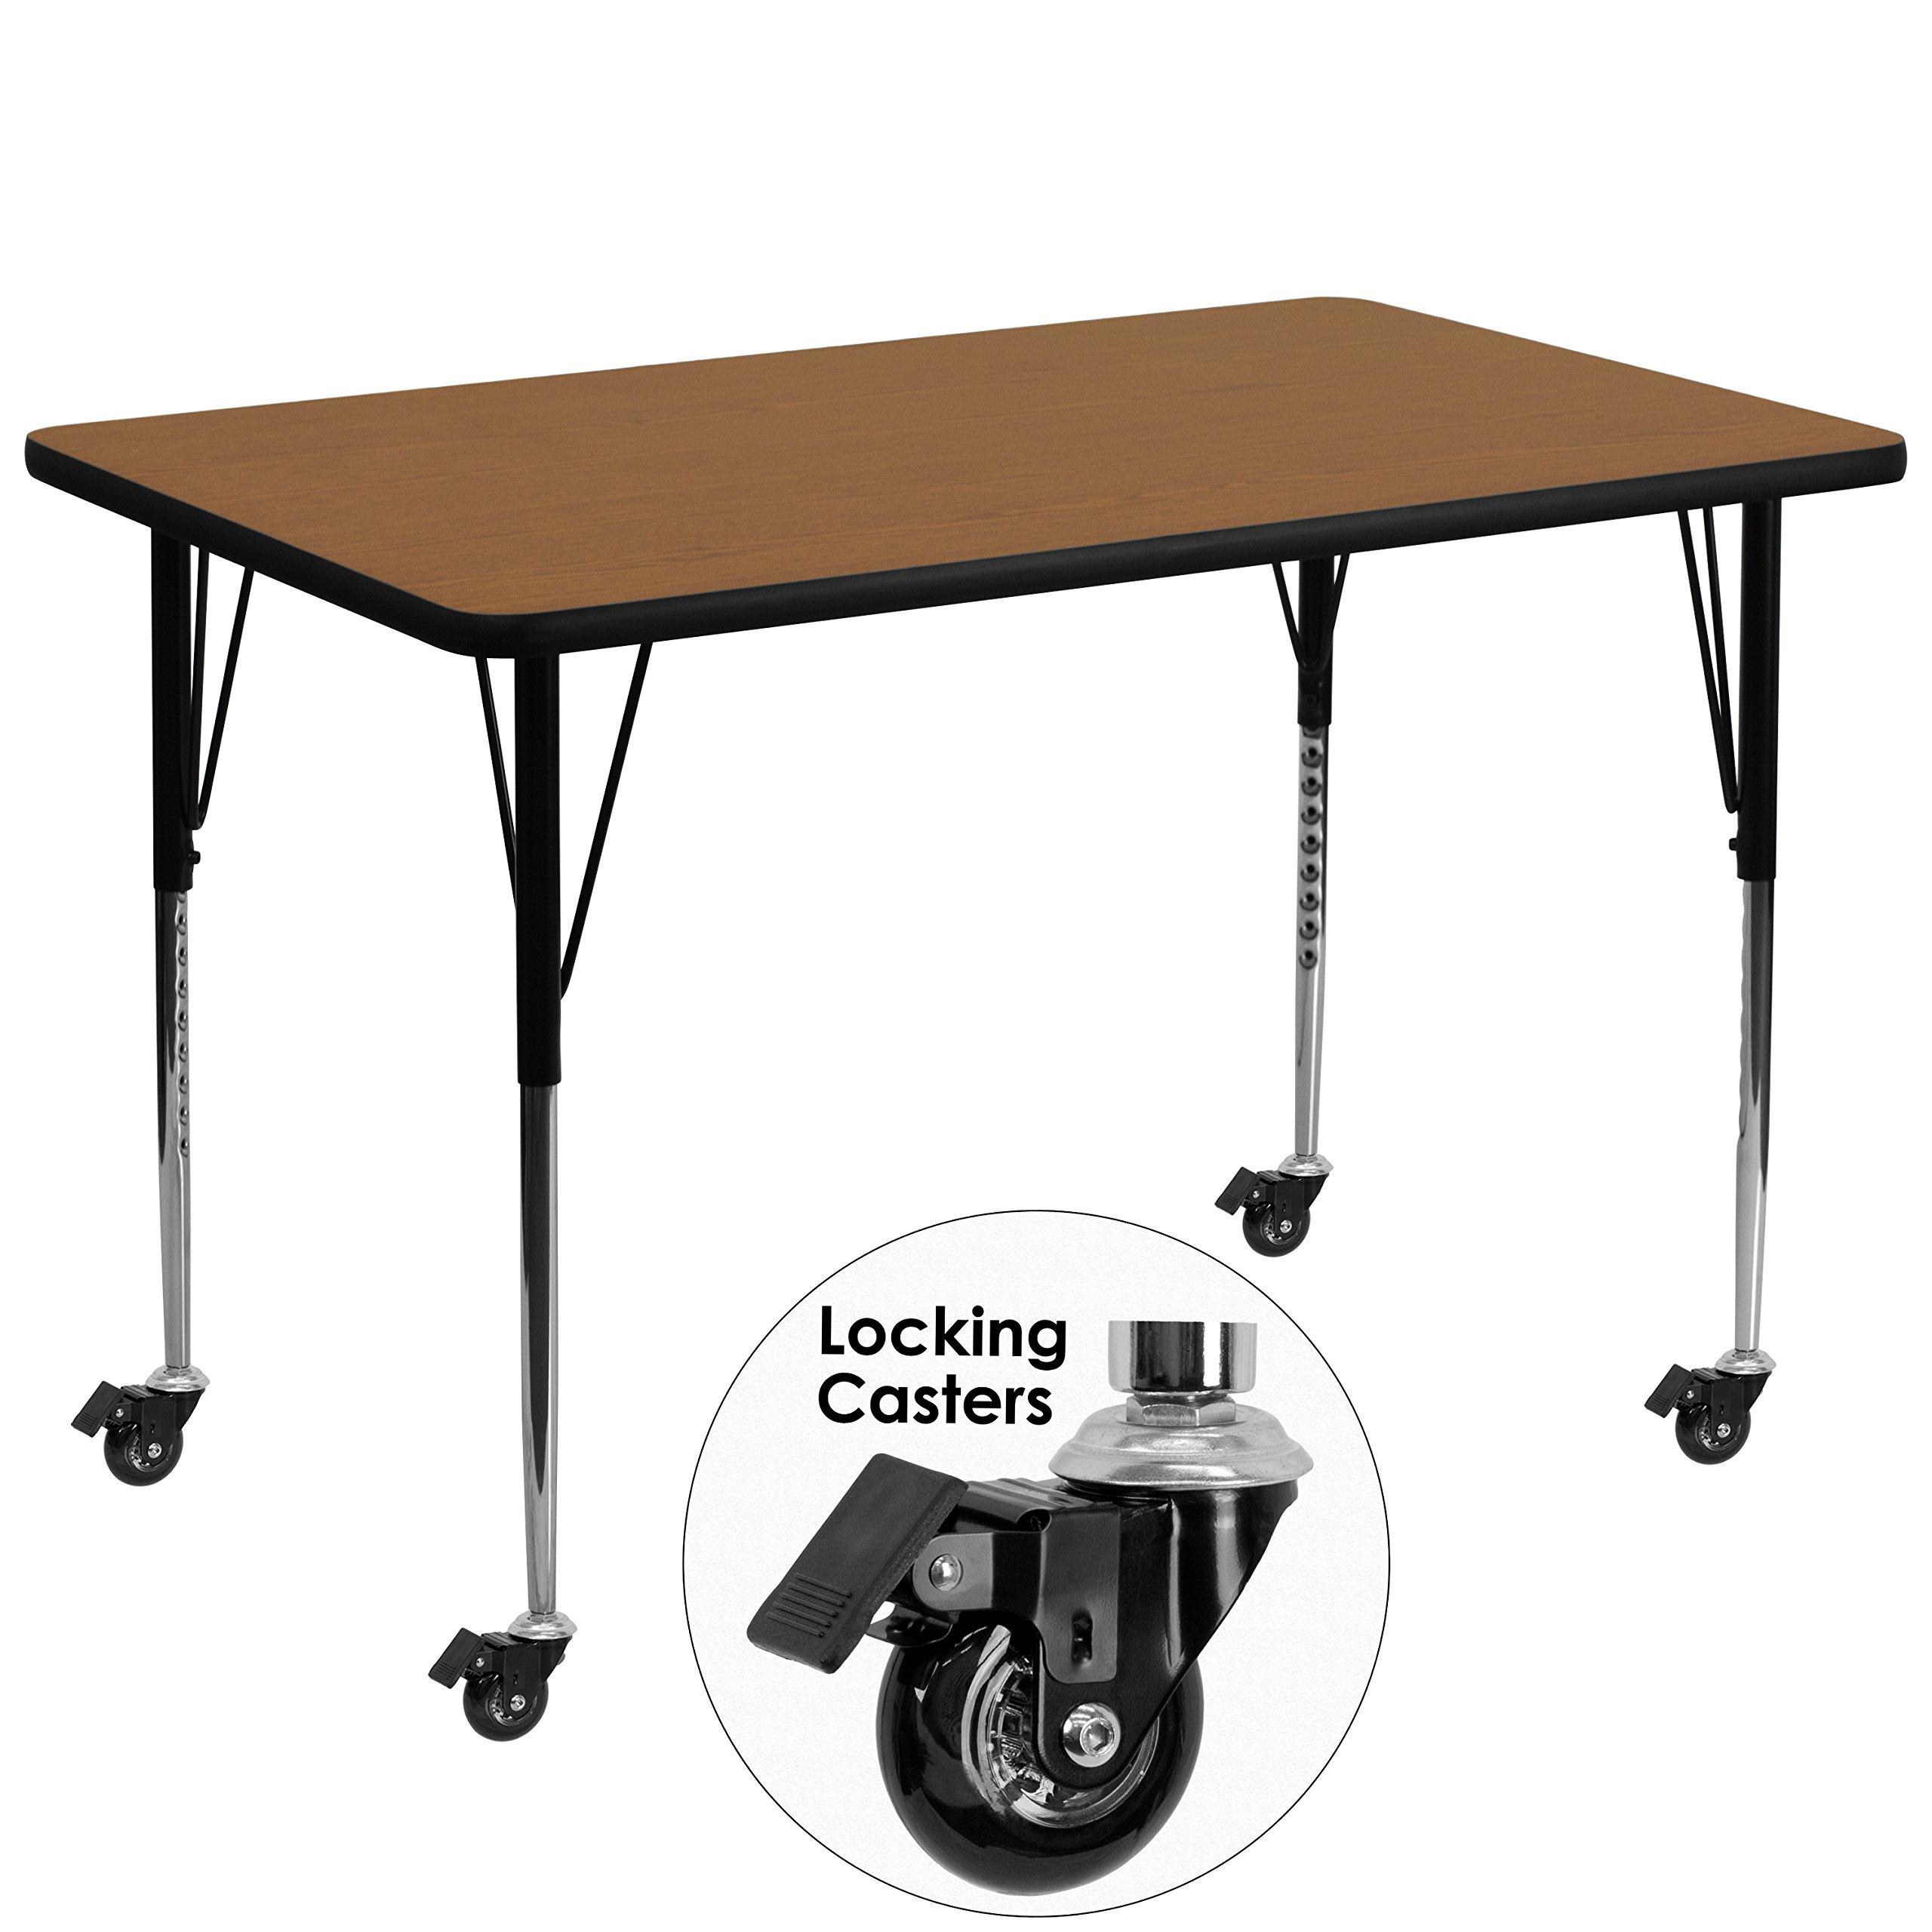 Flash Furniture Mobile 36''W x 72''L Rectangular Oak Thermal Laminate Activity Table - Standard Height Adjustable Legs